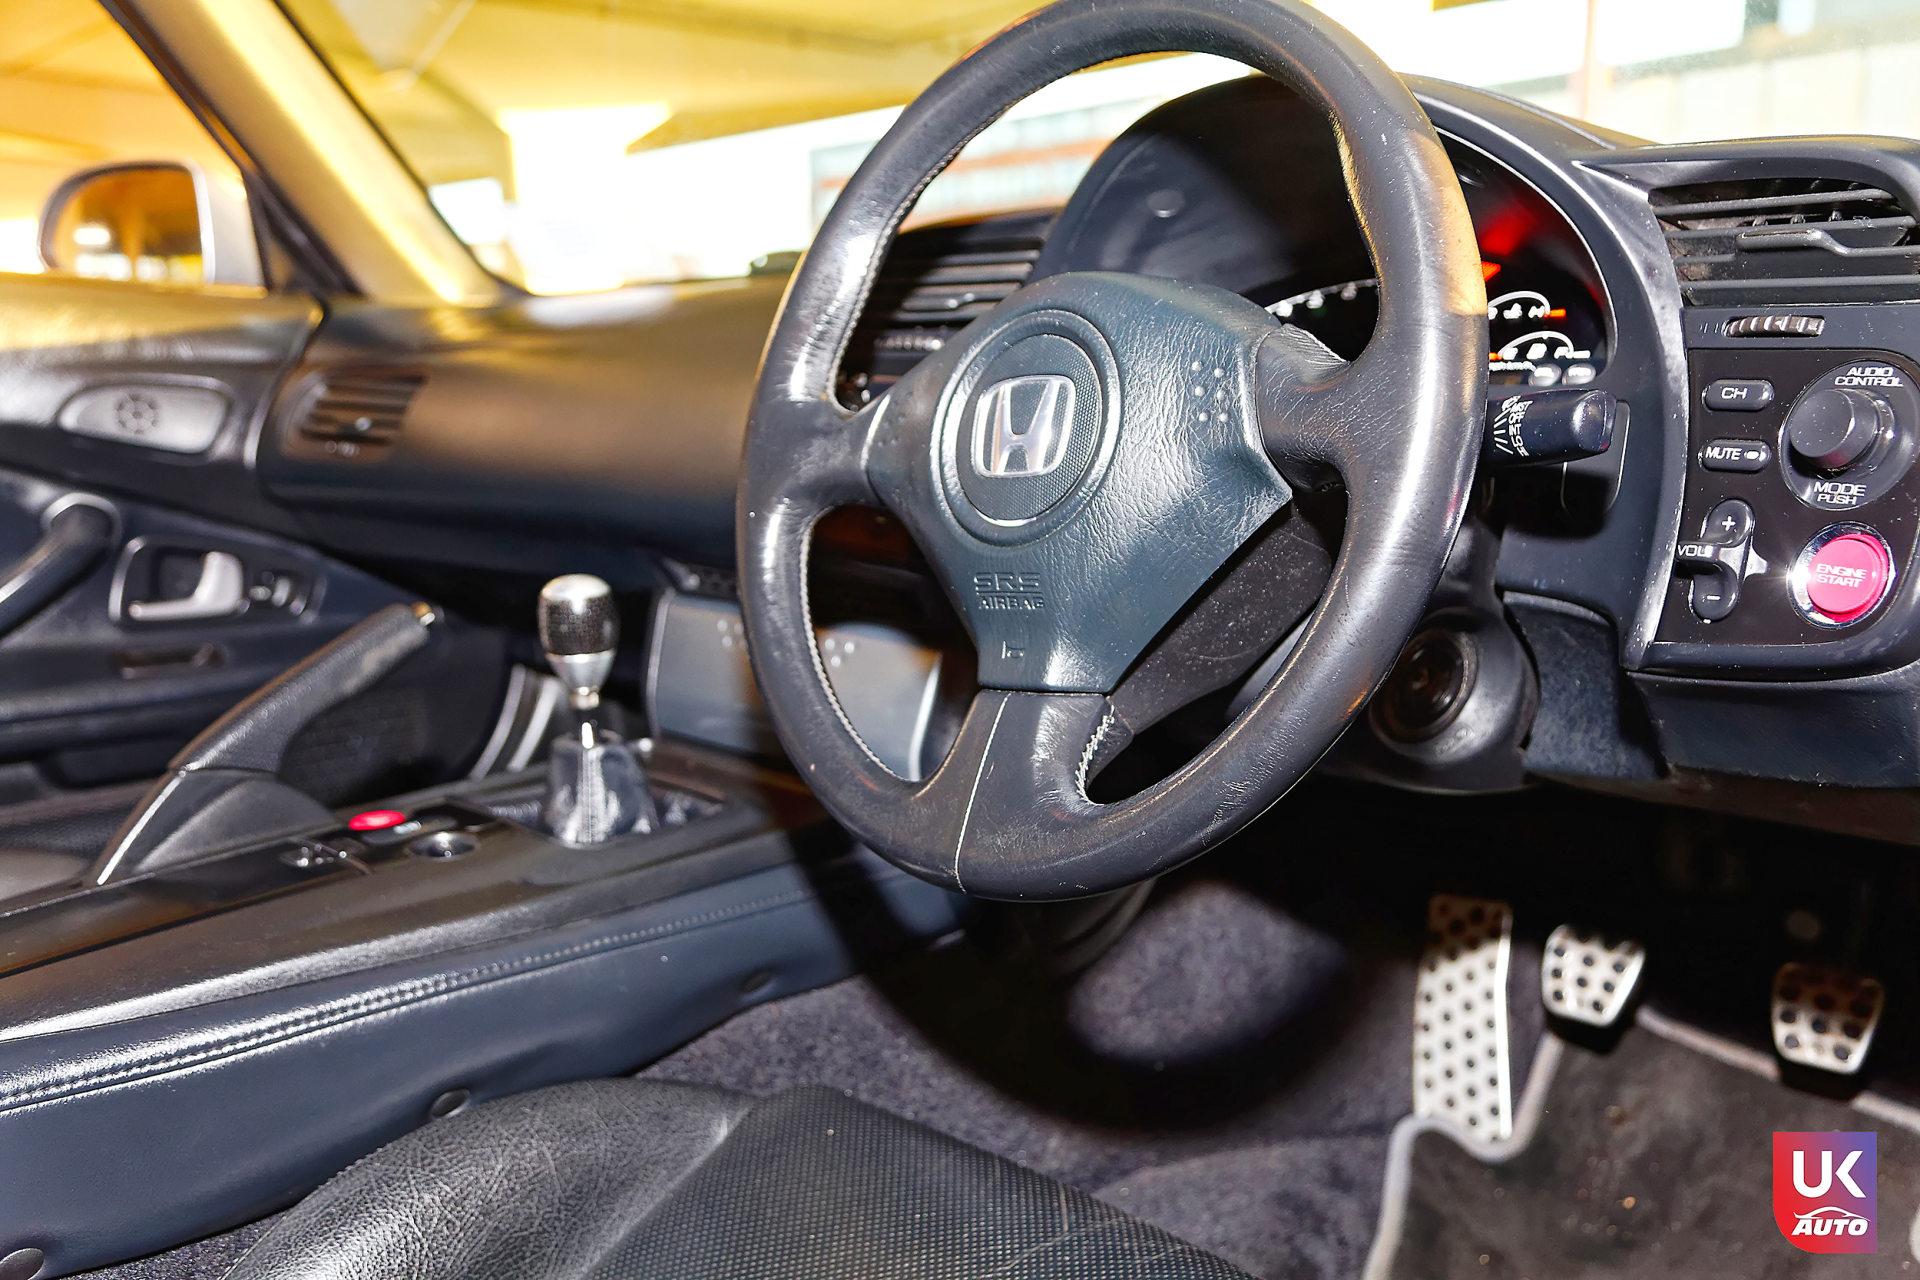 Honda S2000 VTEC RHD UK IMPORT ANGLETERRE HONDA UK ROYAUME UNI6 DxO - Importation angleterre Honda S2000 rhd VTEC honda Royaume uni Felicitation a Alexis